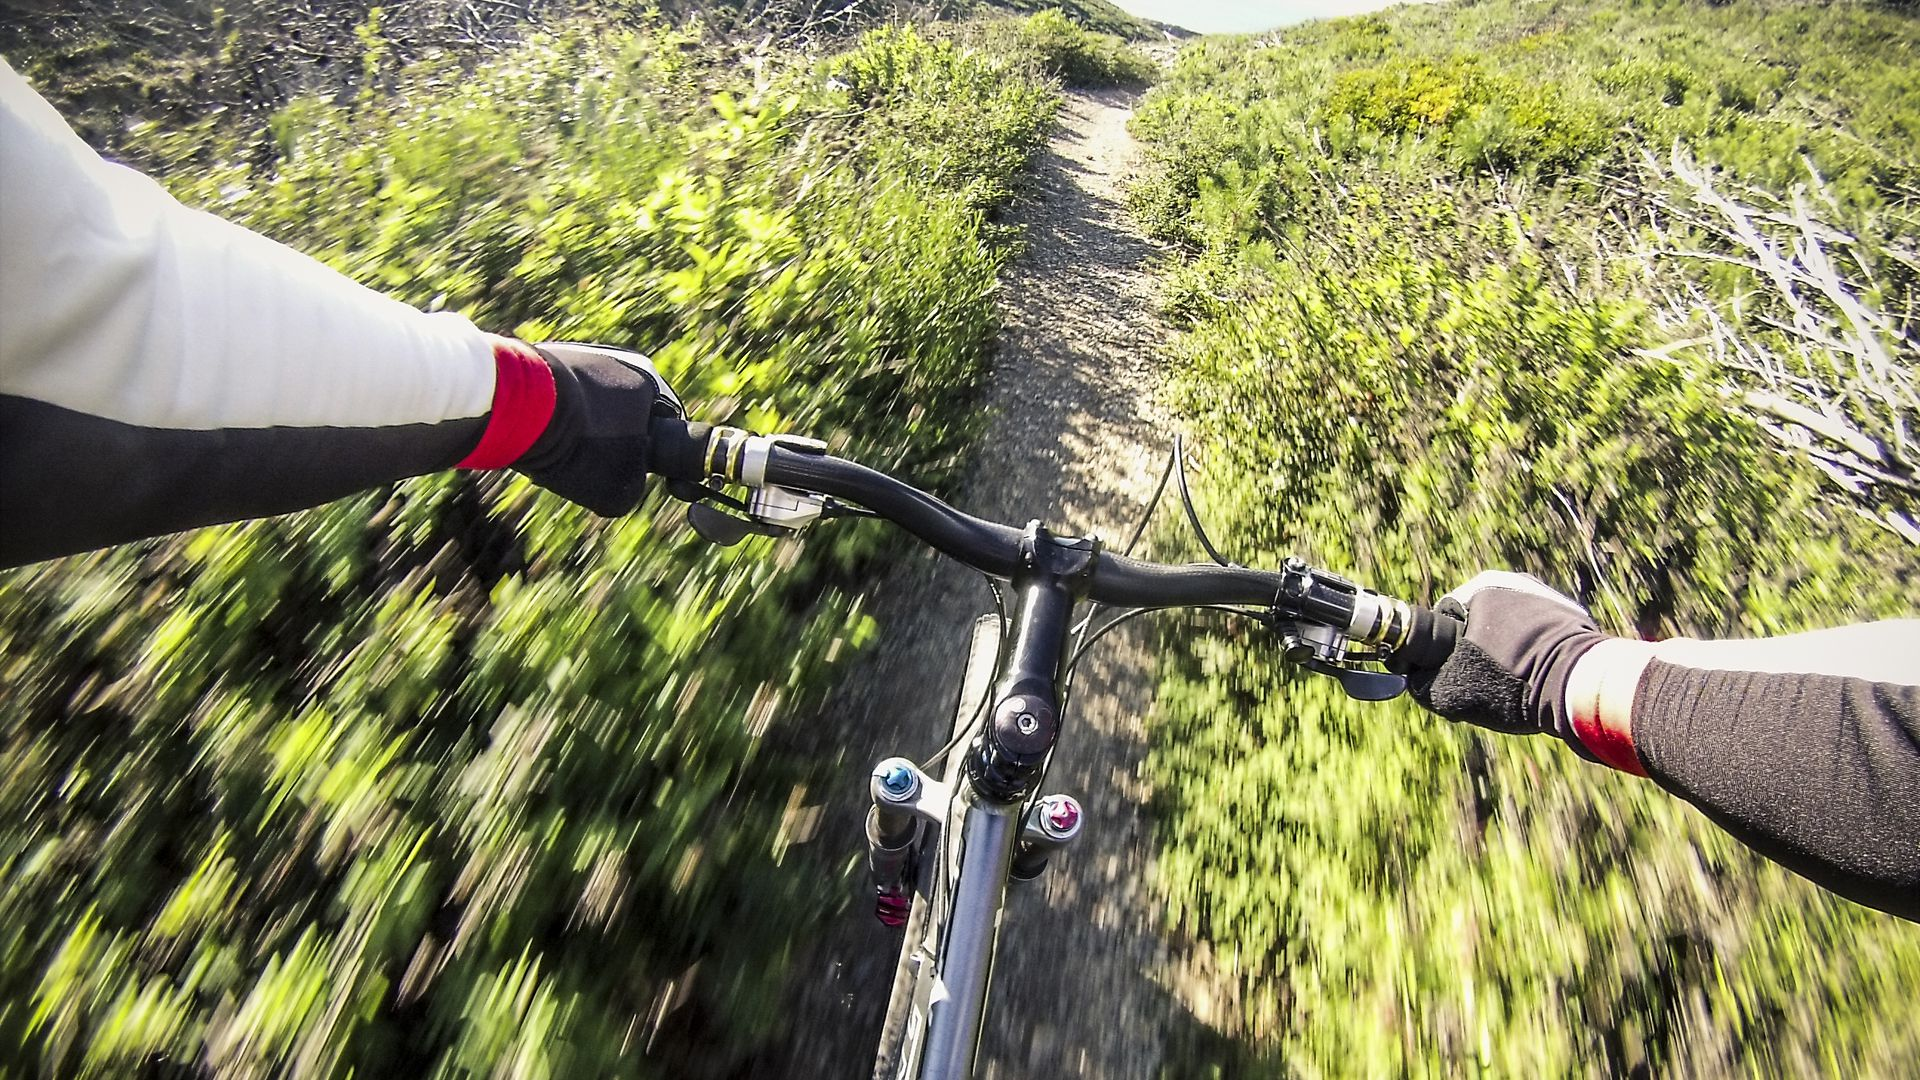 Biker using GoPro camera